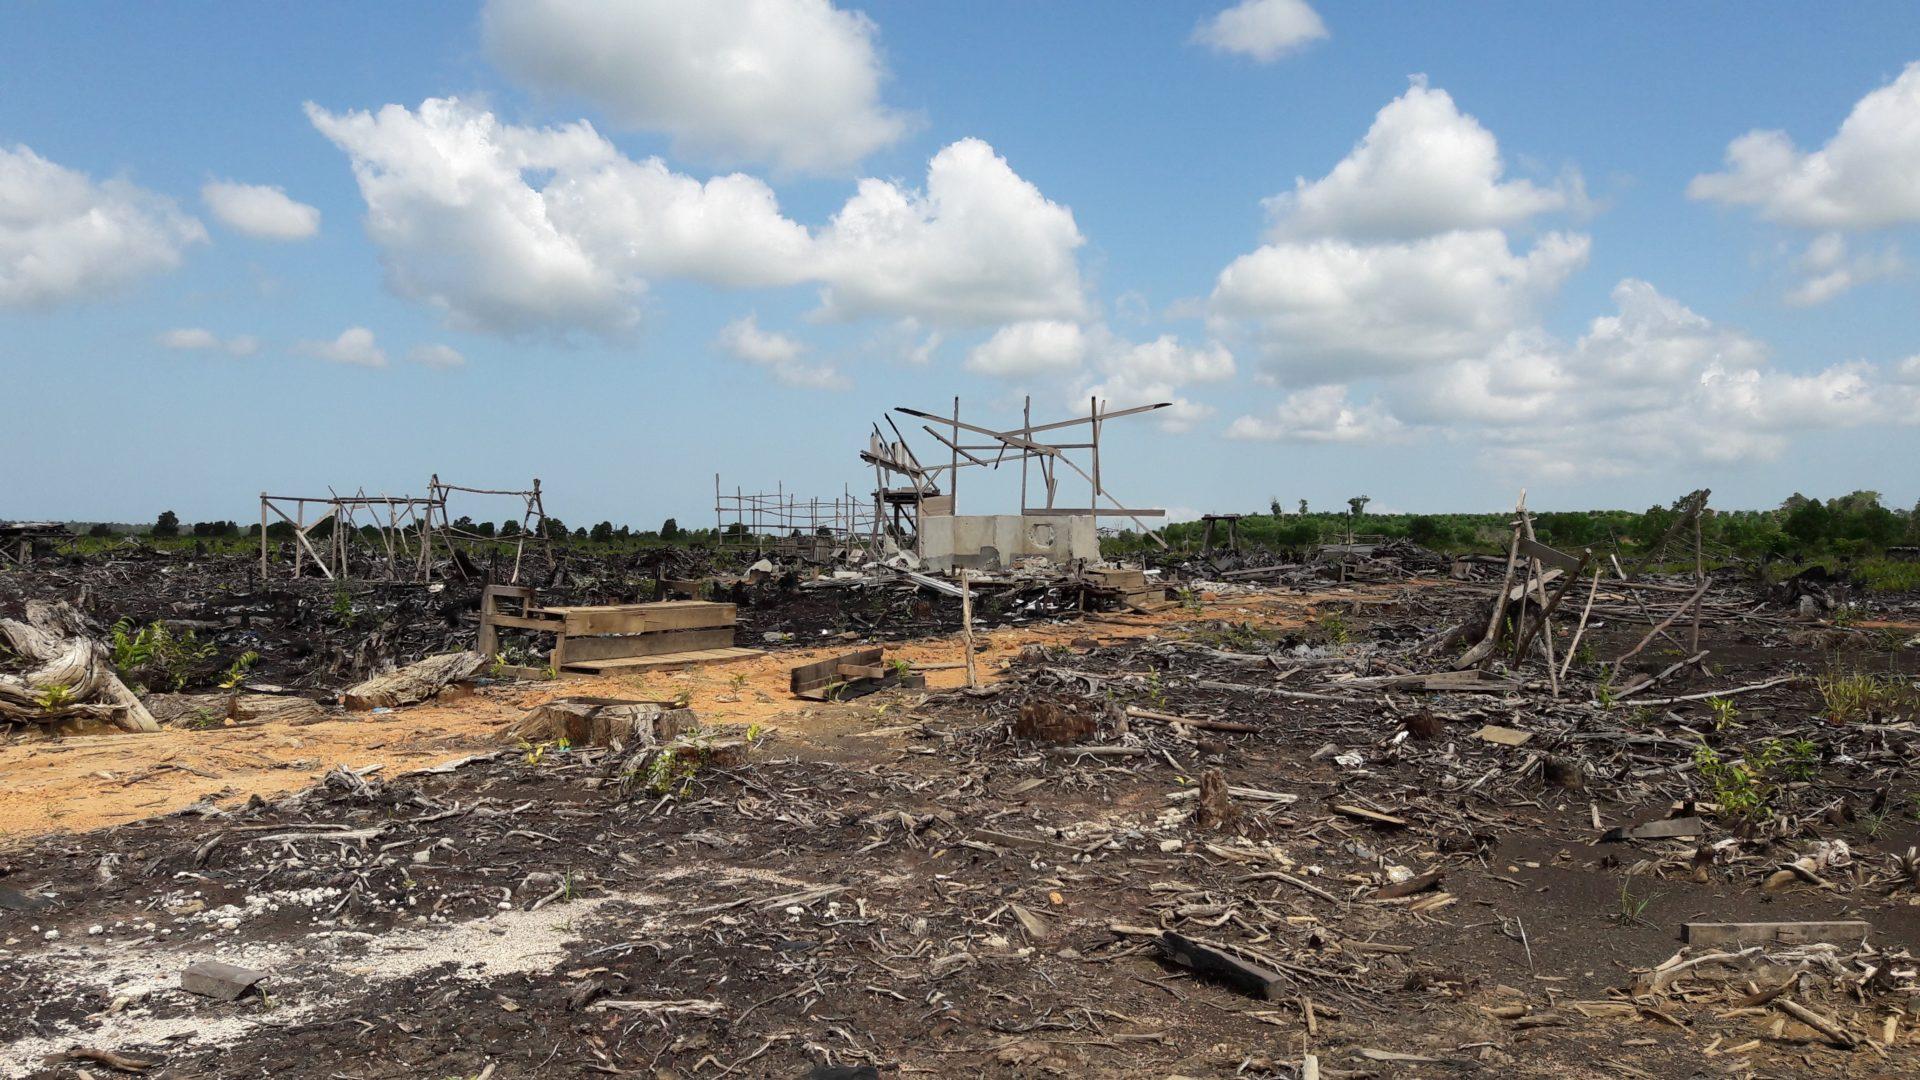 Abgebrannte und verlassene Gafatar-Farm in Mempawah, West-Kalimantan © Andreas Harsono